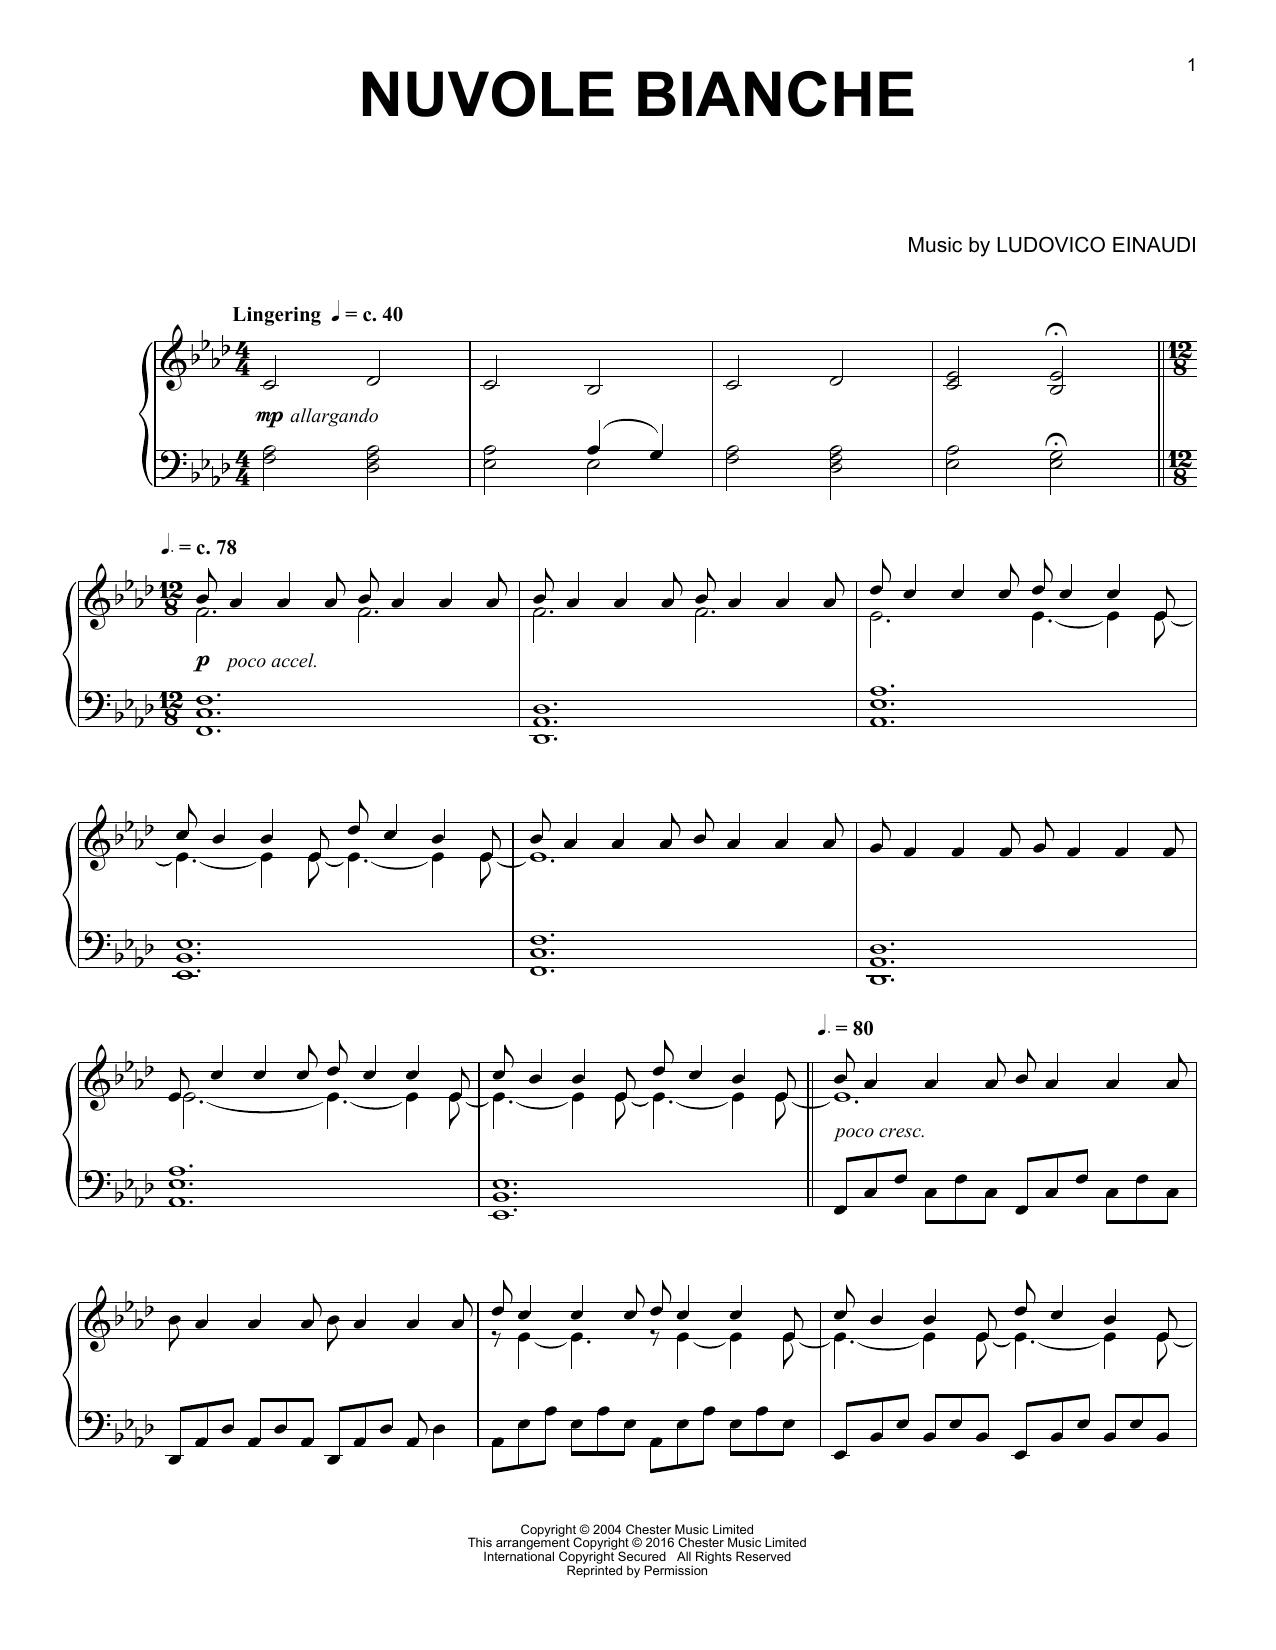 Nuvole Bianche sheet music